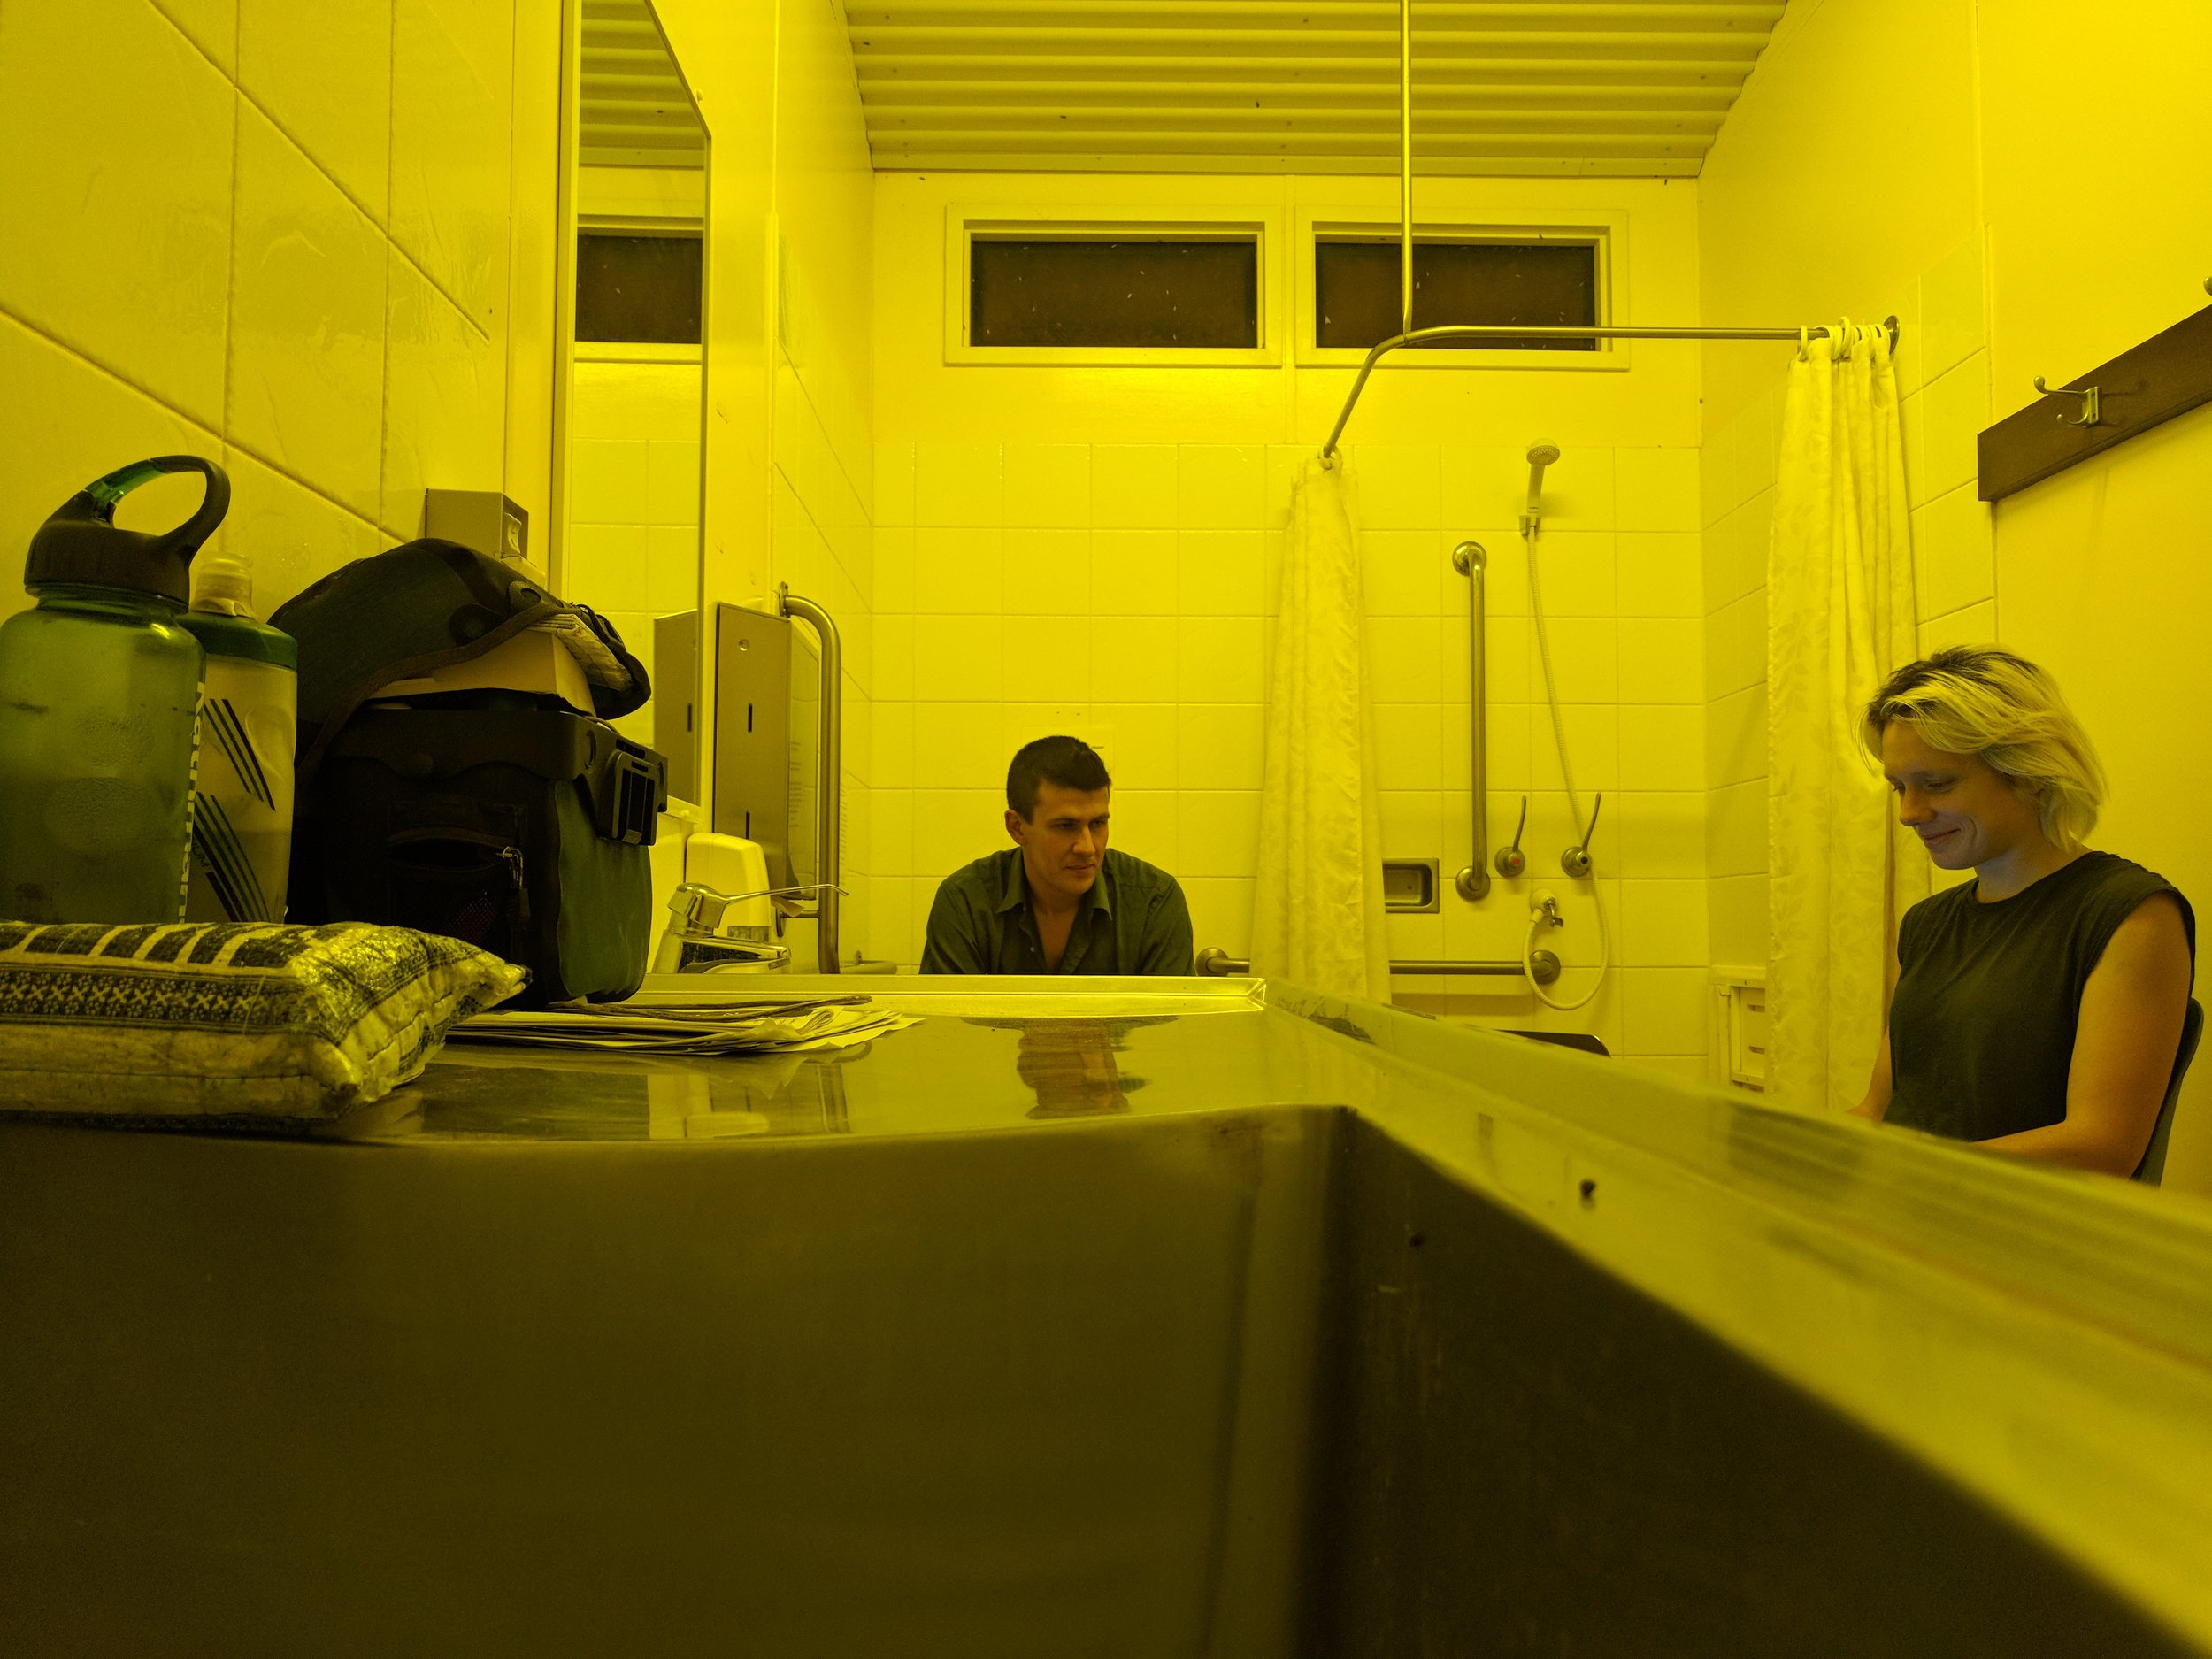 Office a'la disabled toilet.